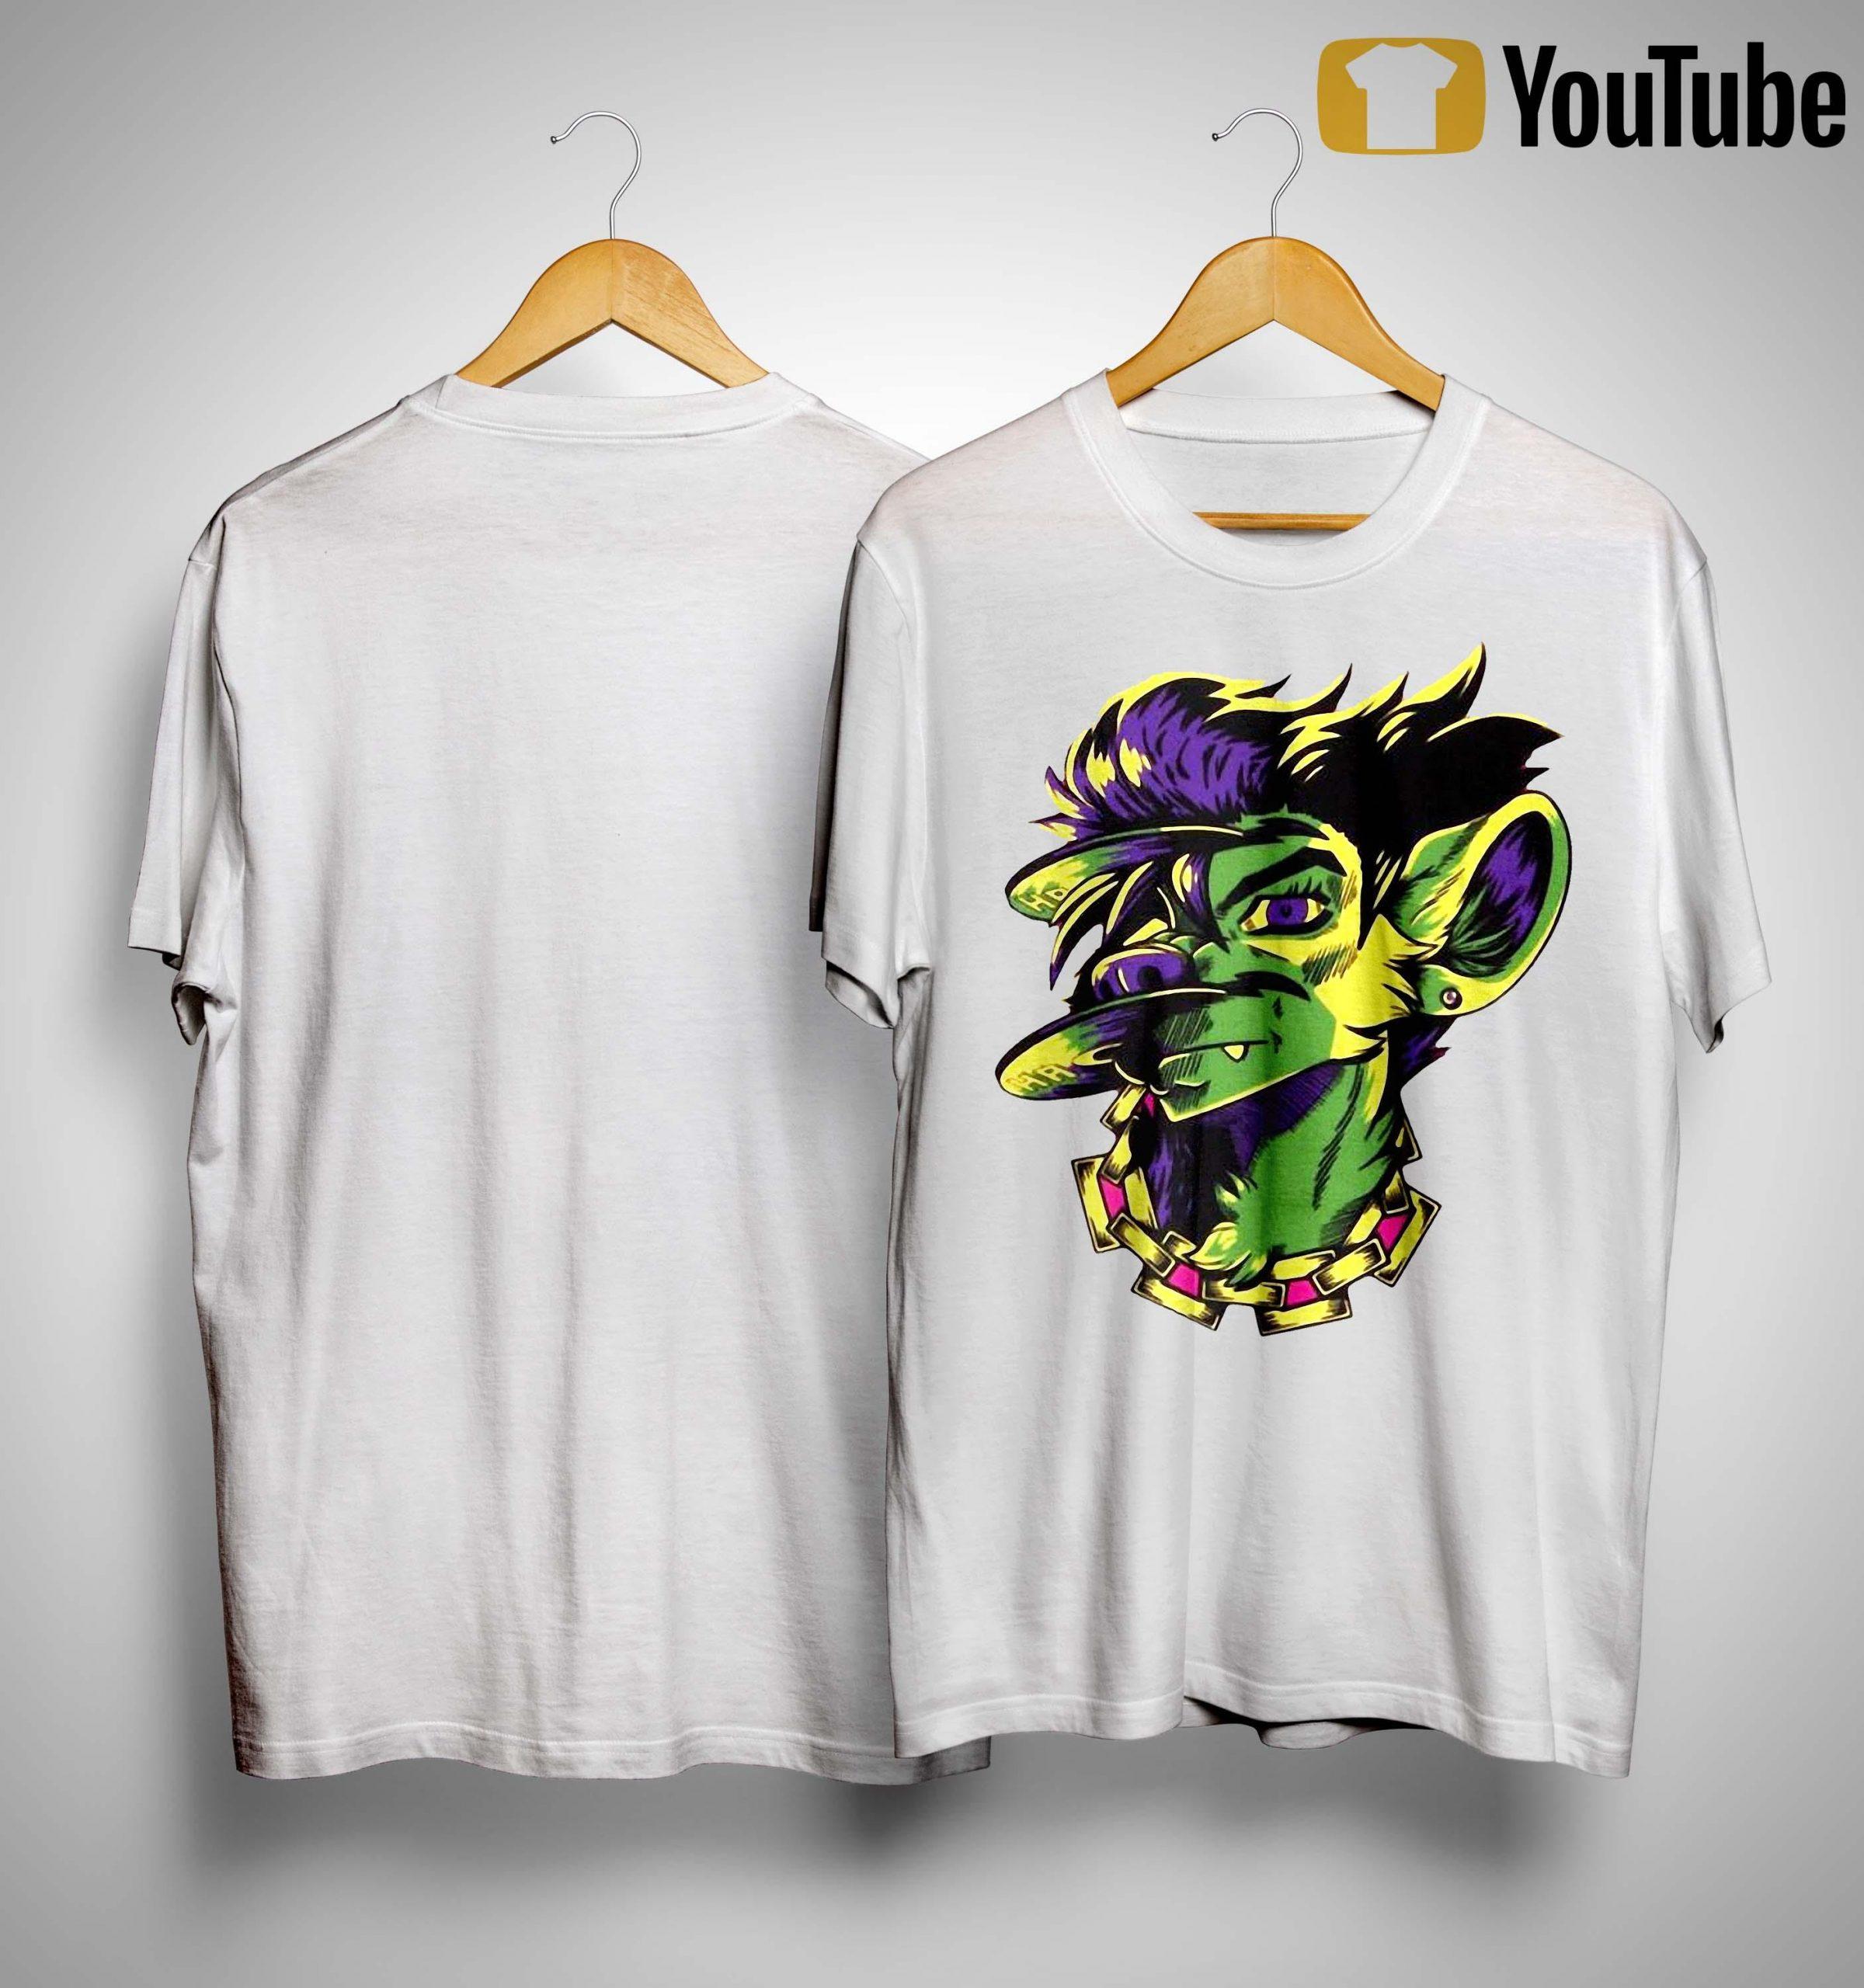 Hyena Agenda Store Merch Eject Shirt